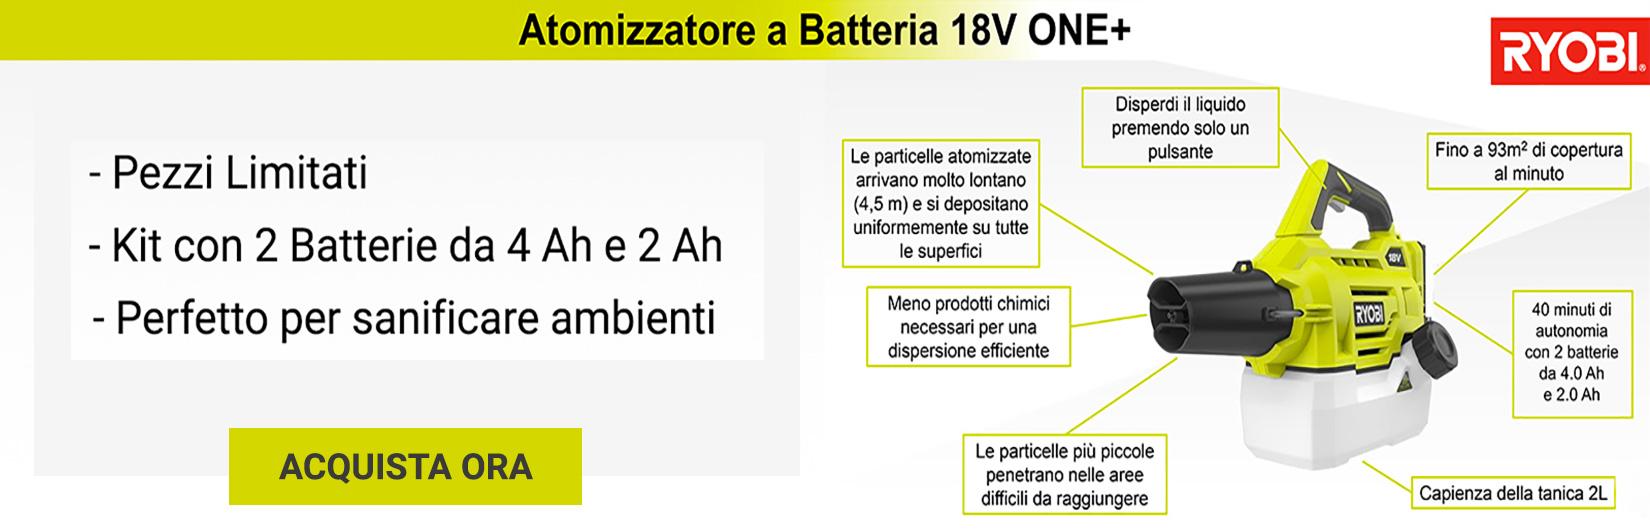 Atomizzatore Ryobi a batteria RY18FGA.